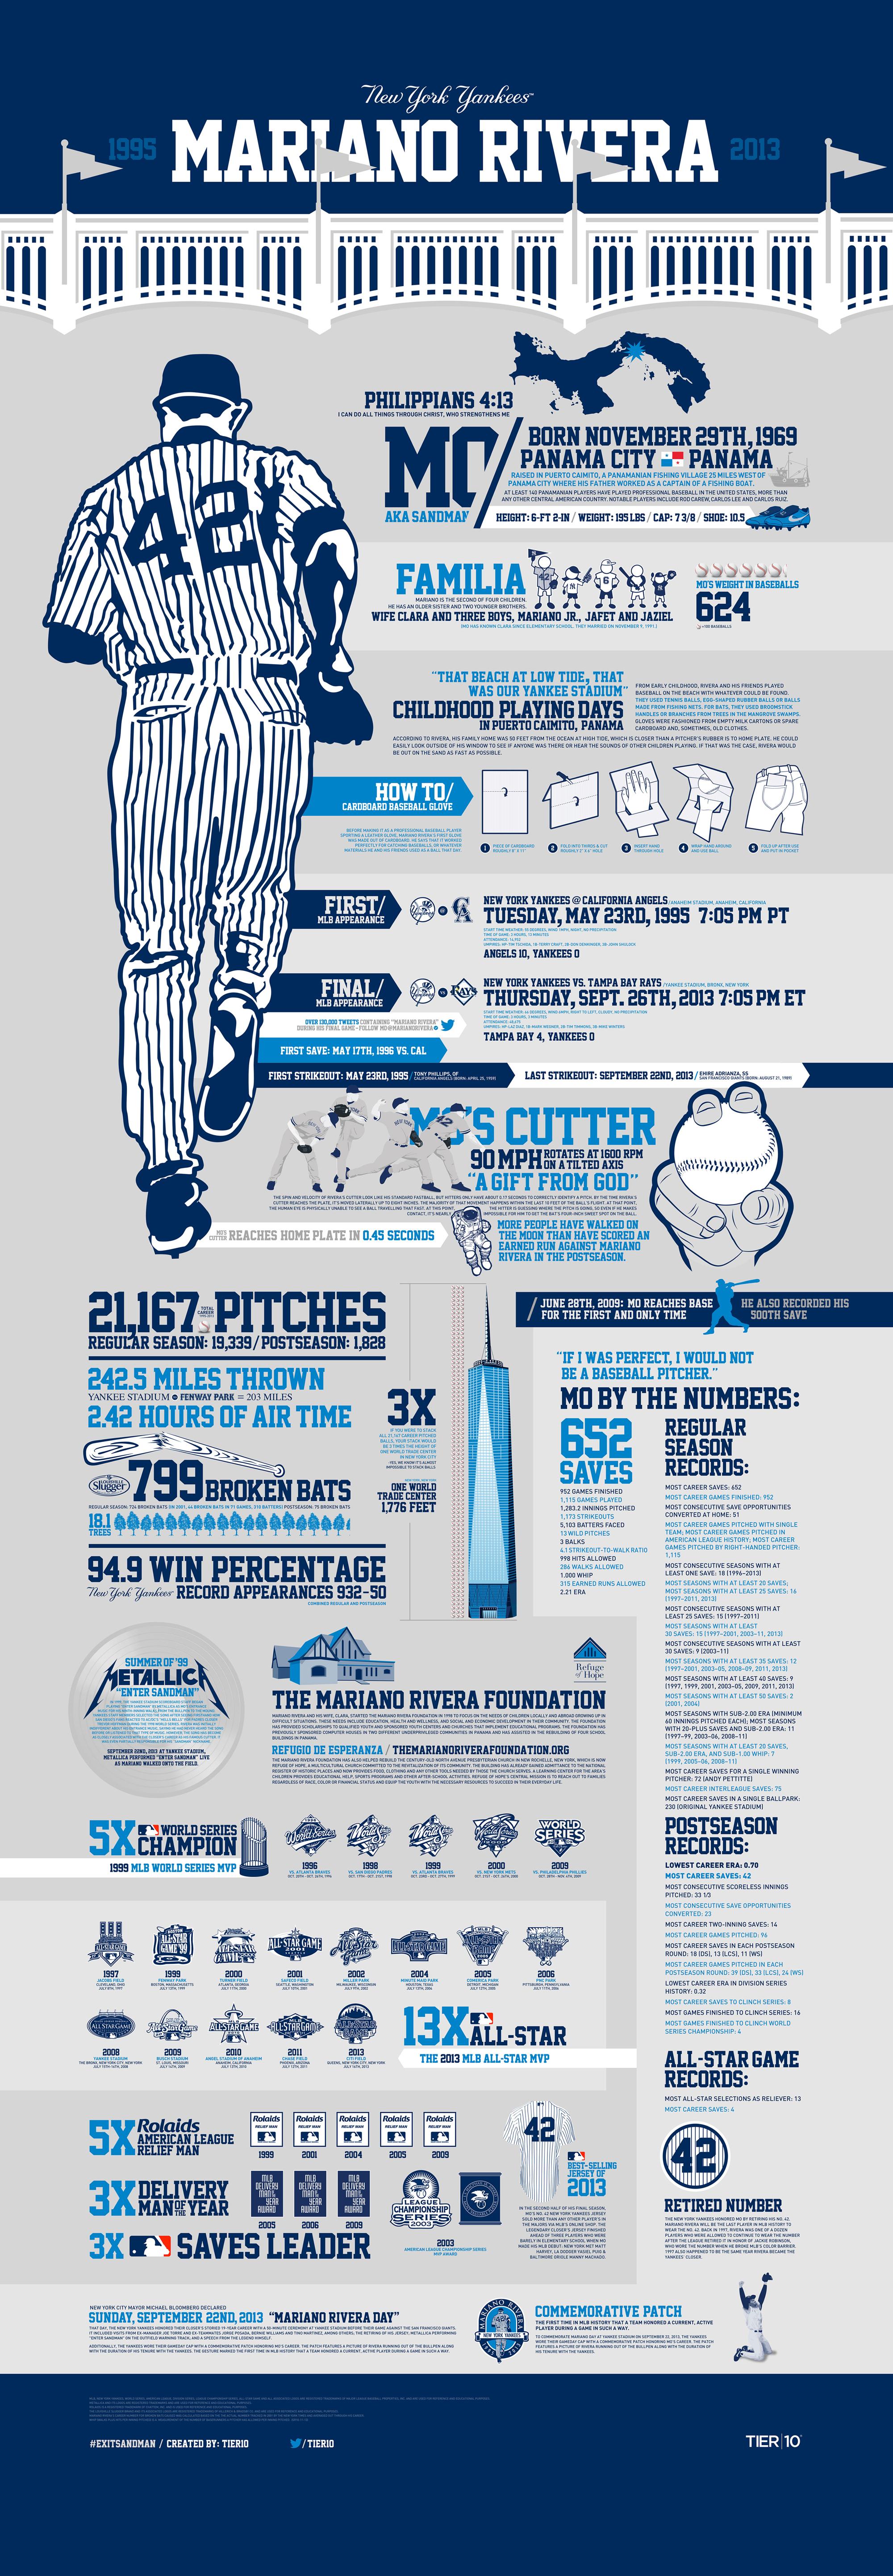 Mariano Rivera Infographic